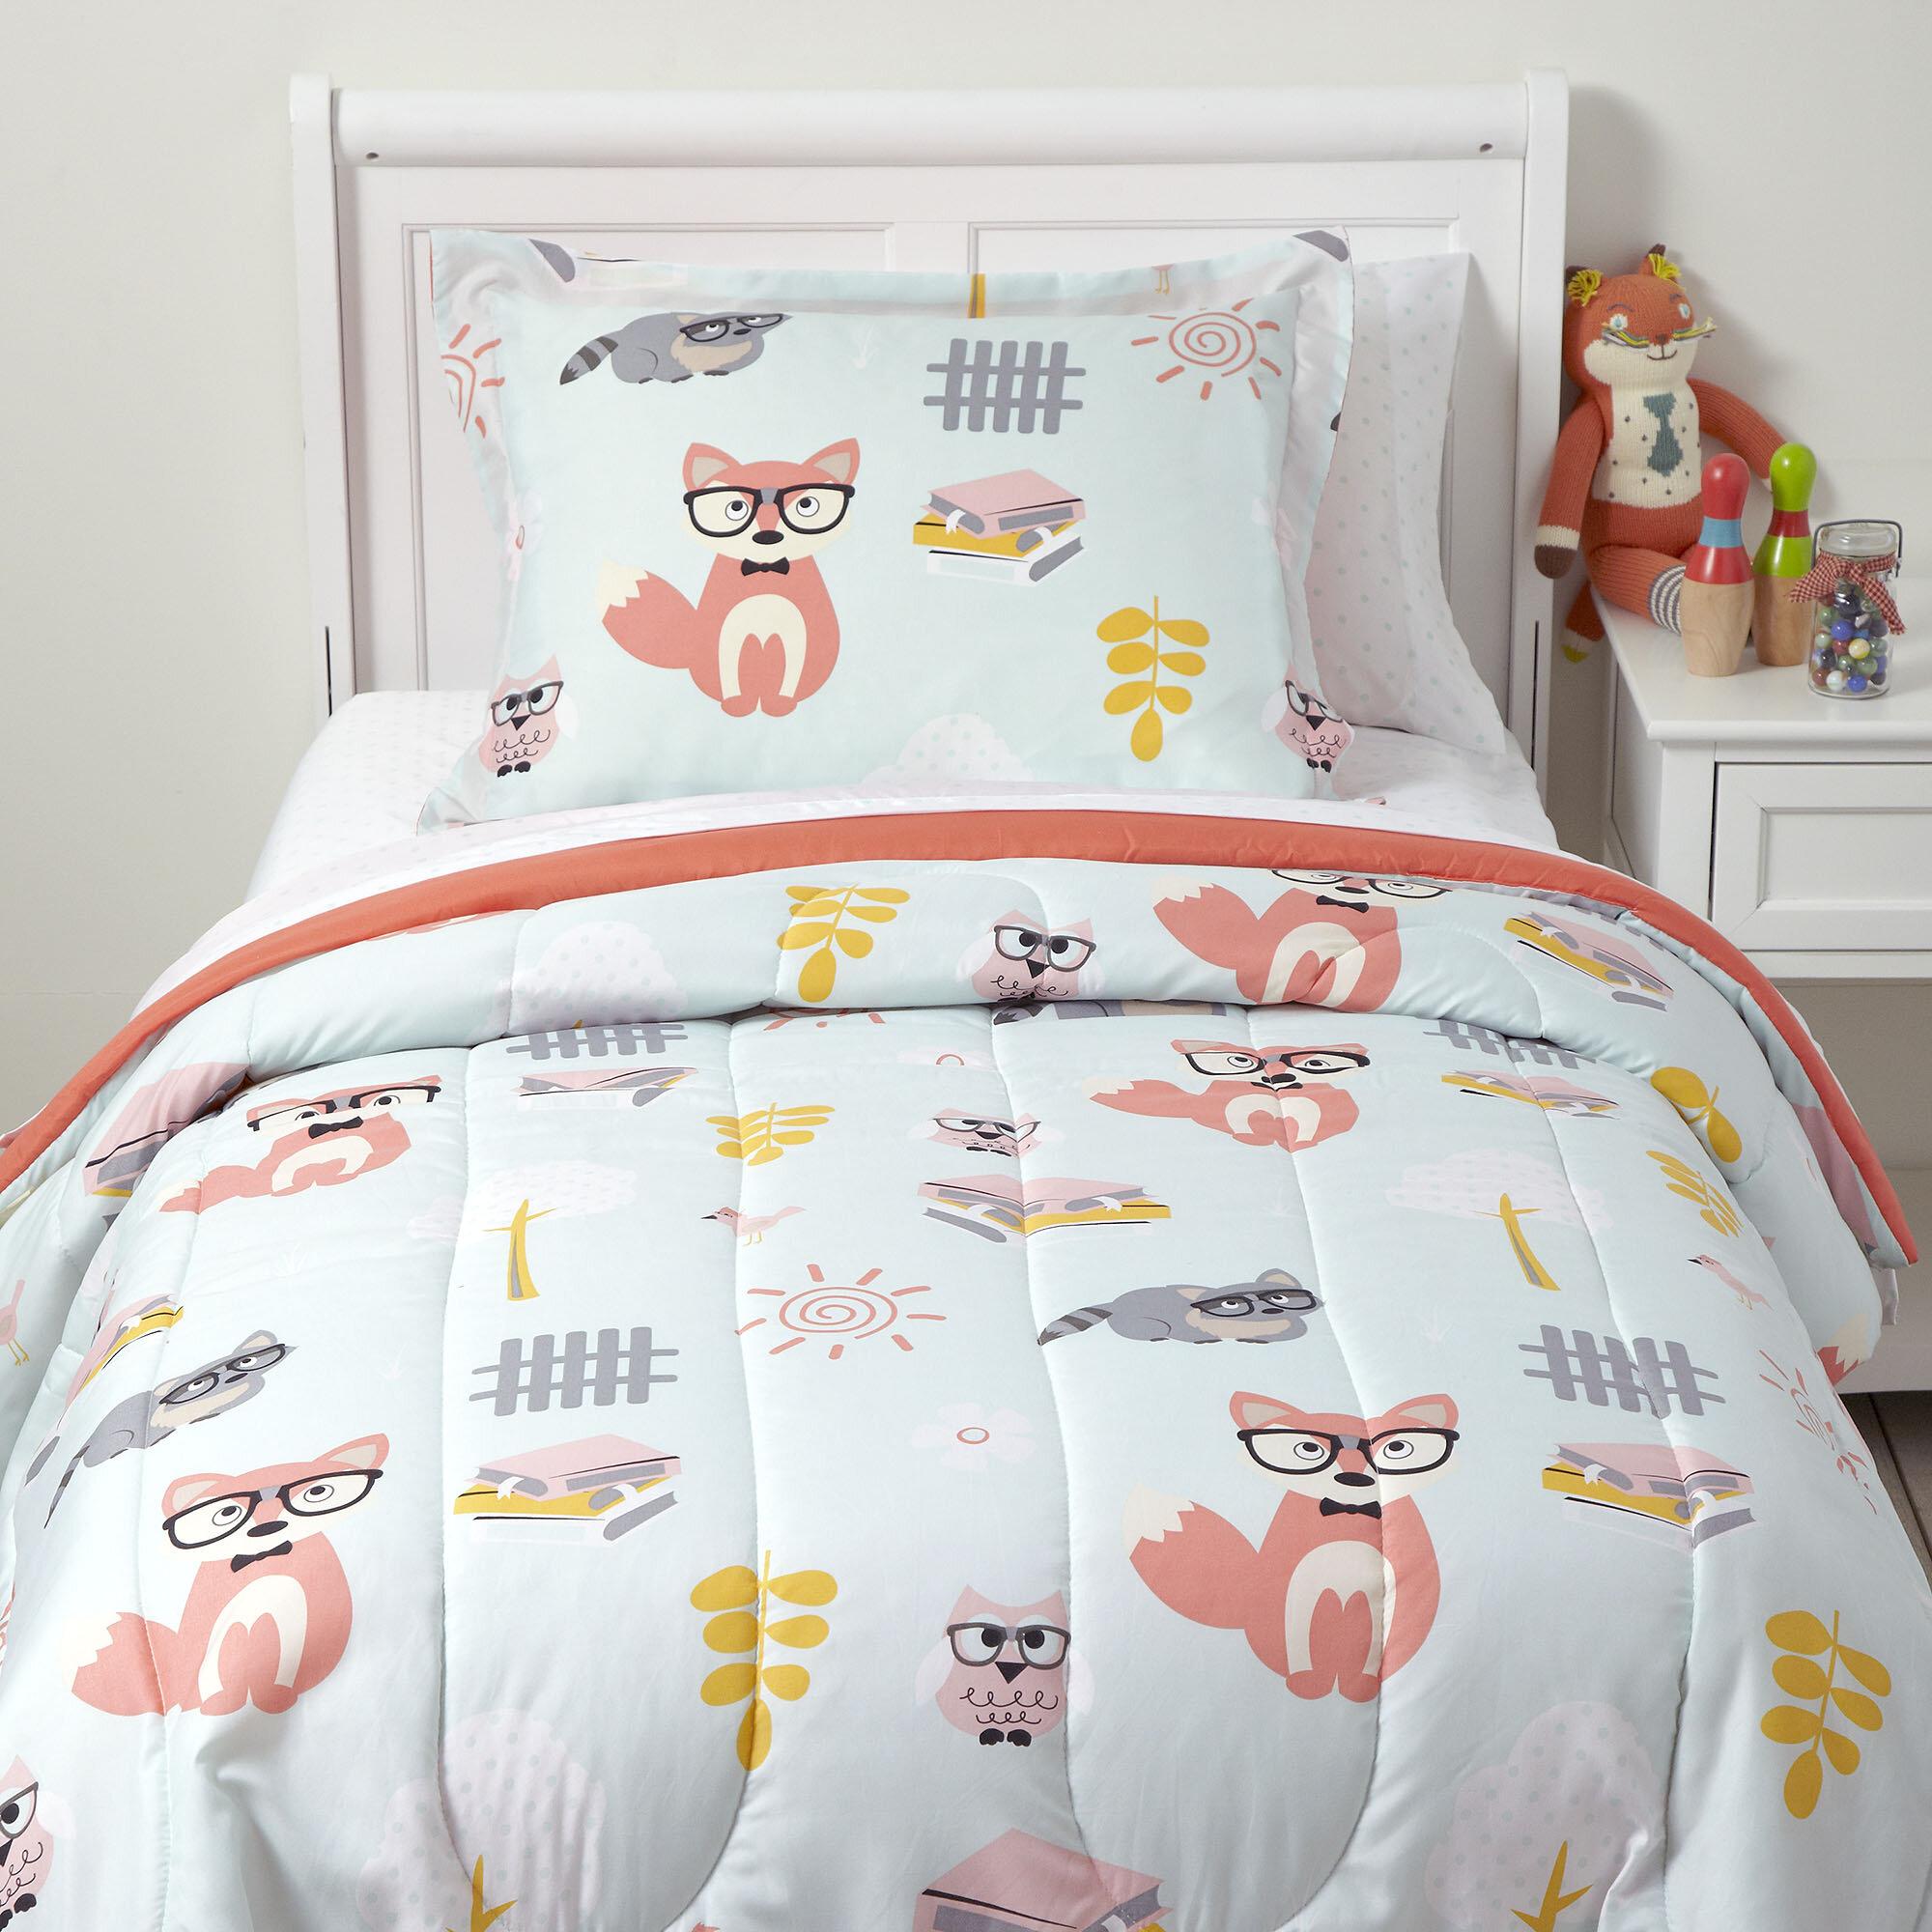 crib peanutshell bsps sets bedding dah bed from the set